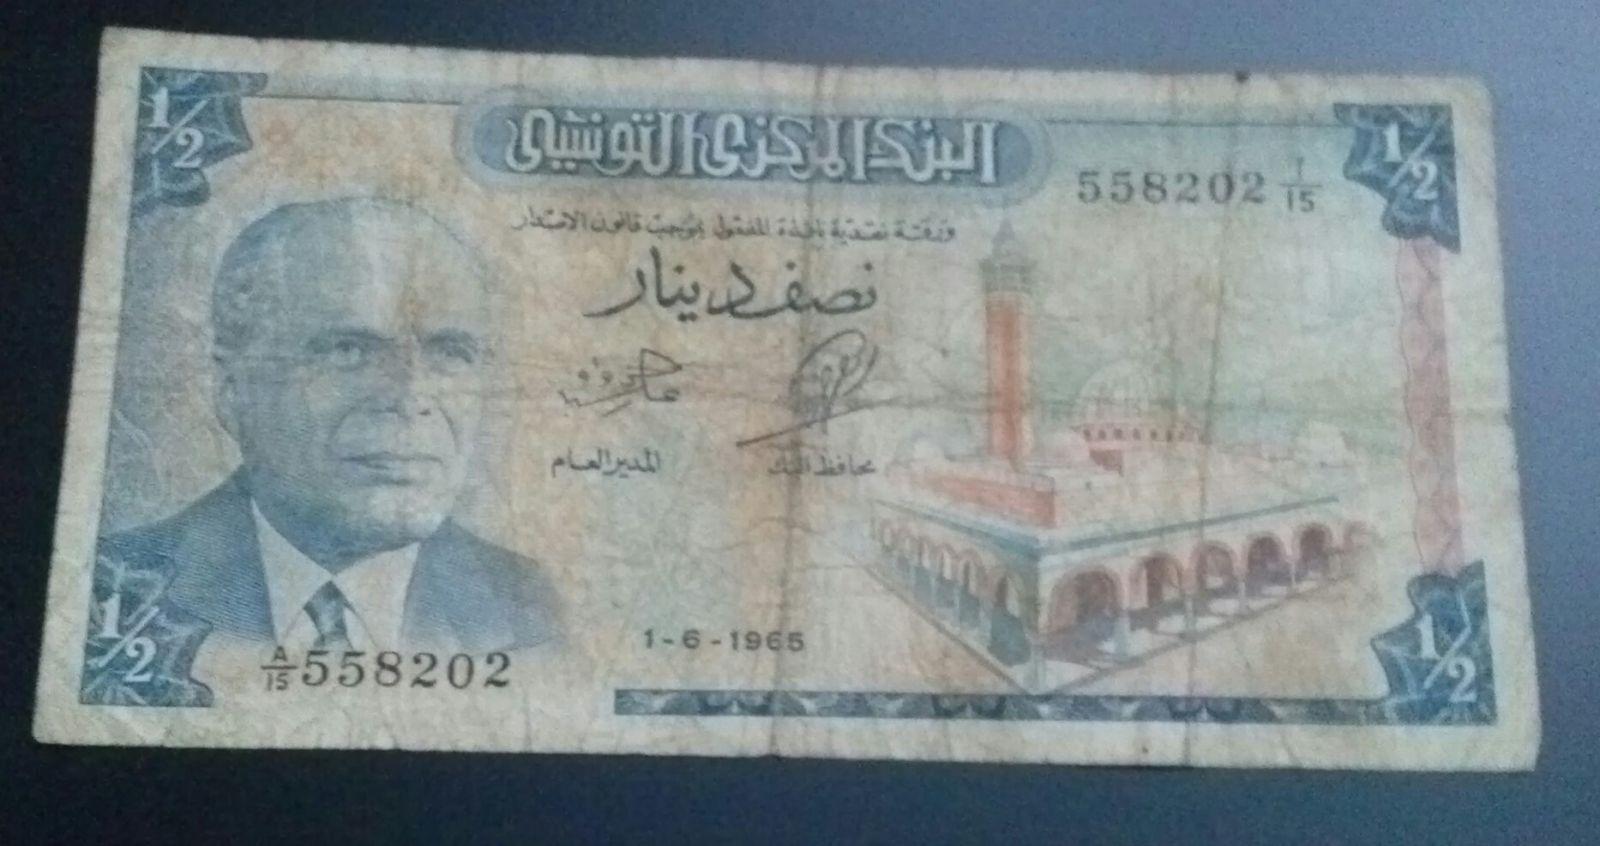 Tunisia 1/2 Dinar 1965 (Dritto)